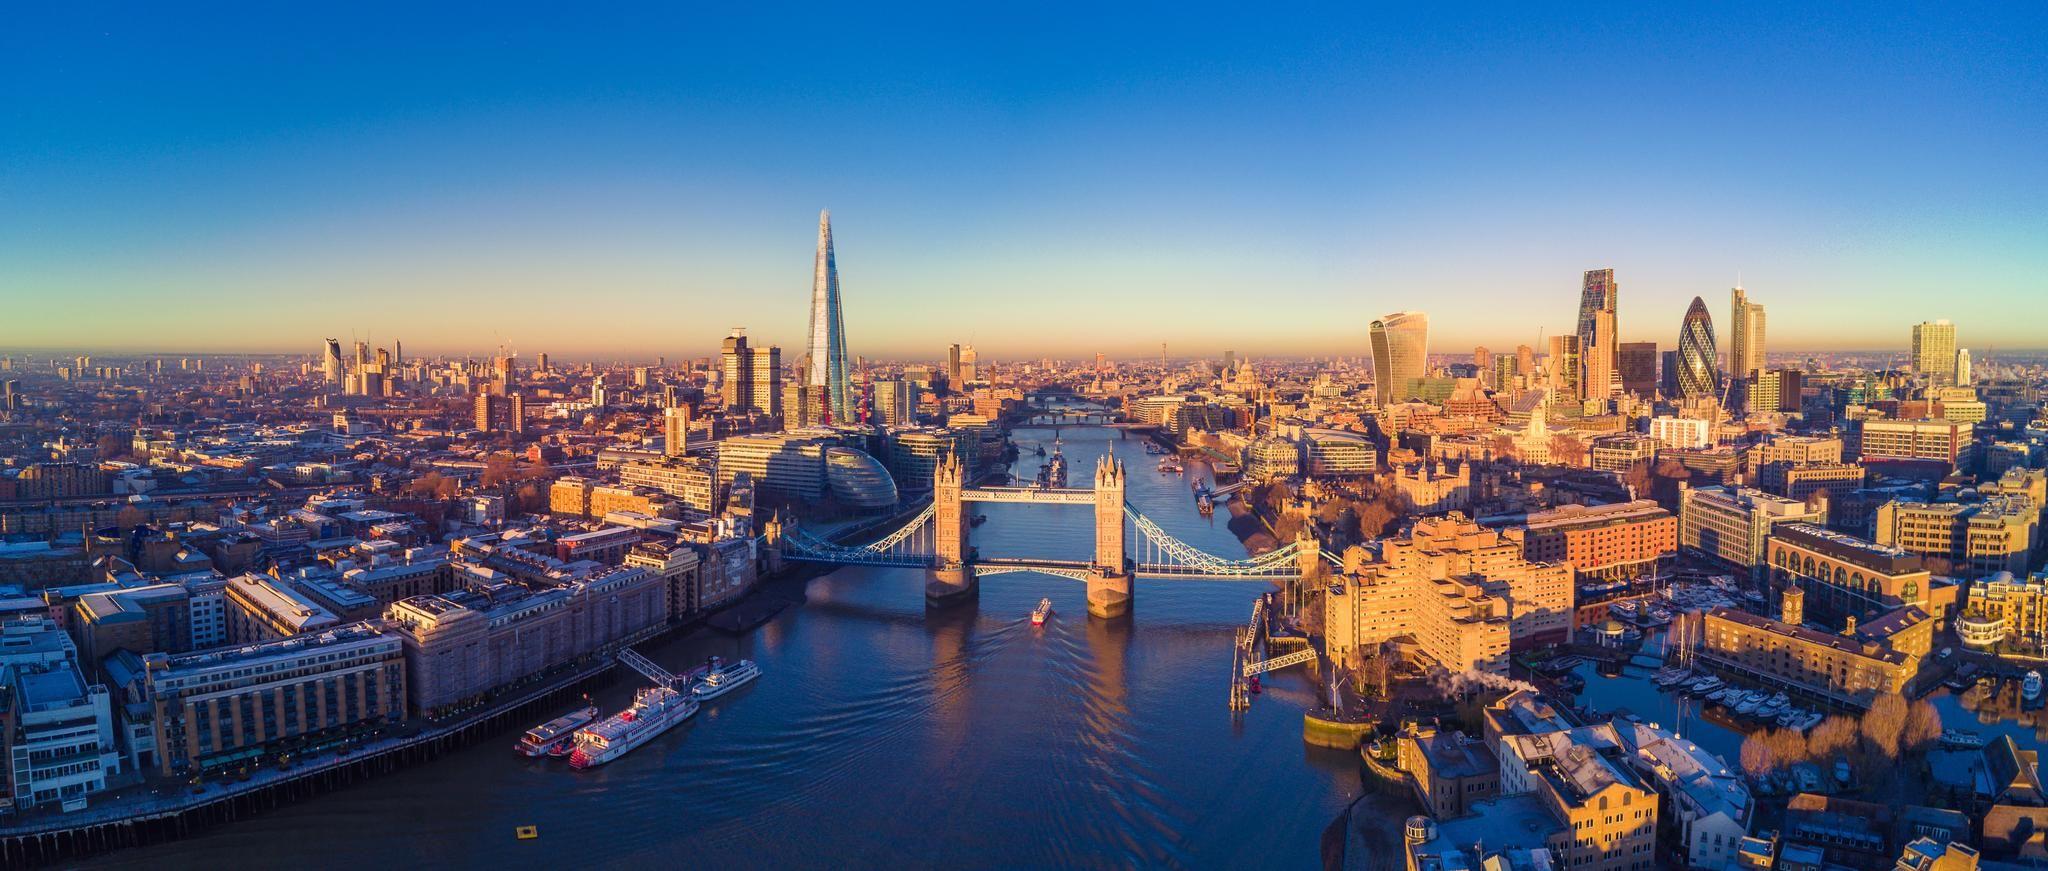 Enjoy panoramic views of London